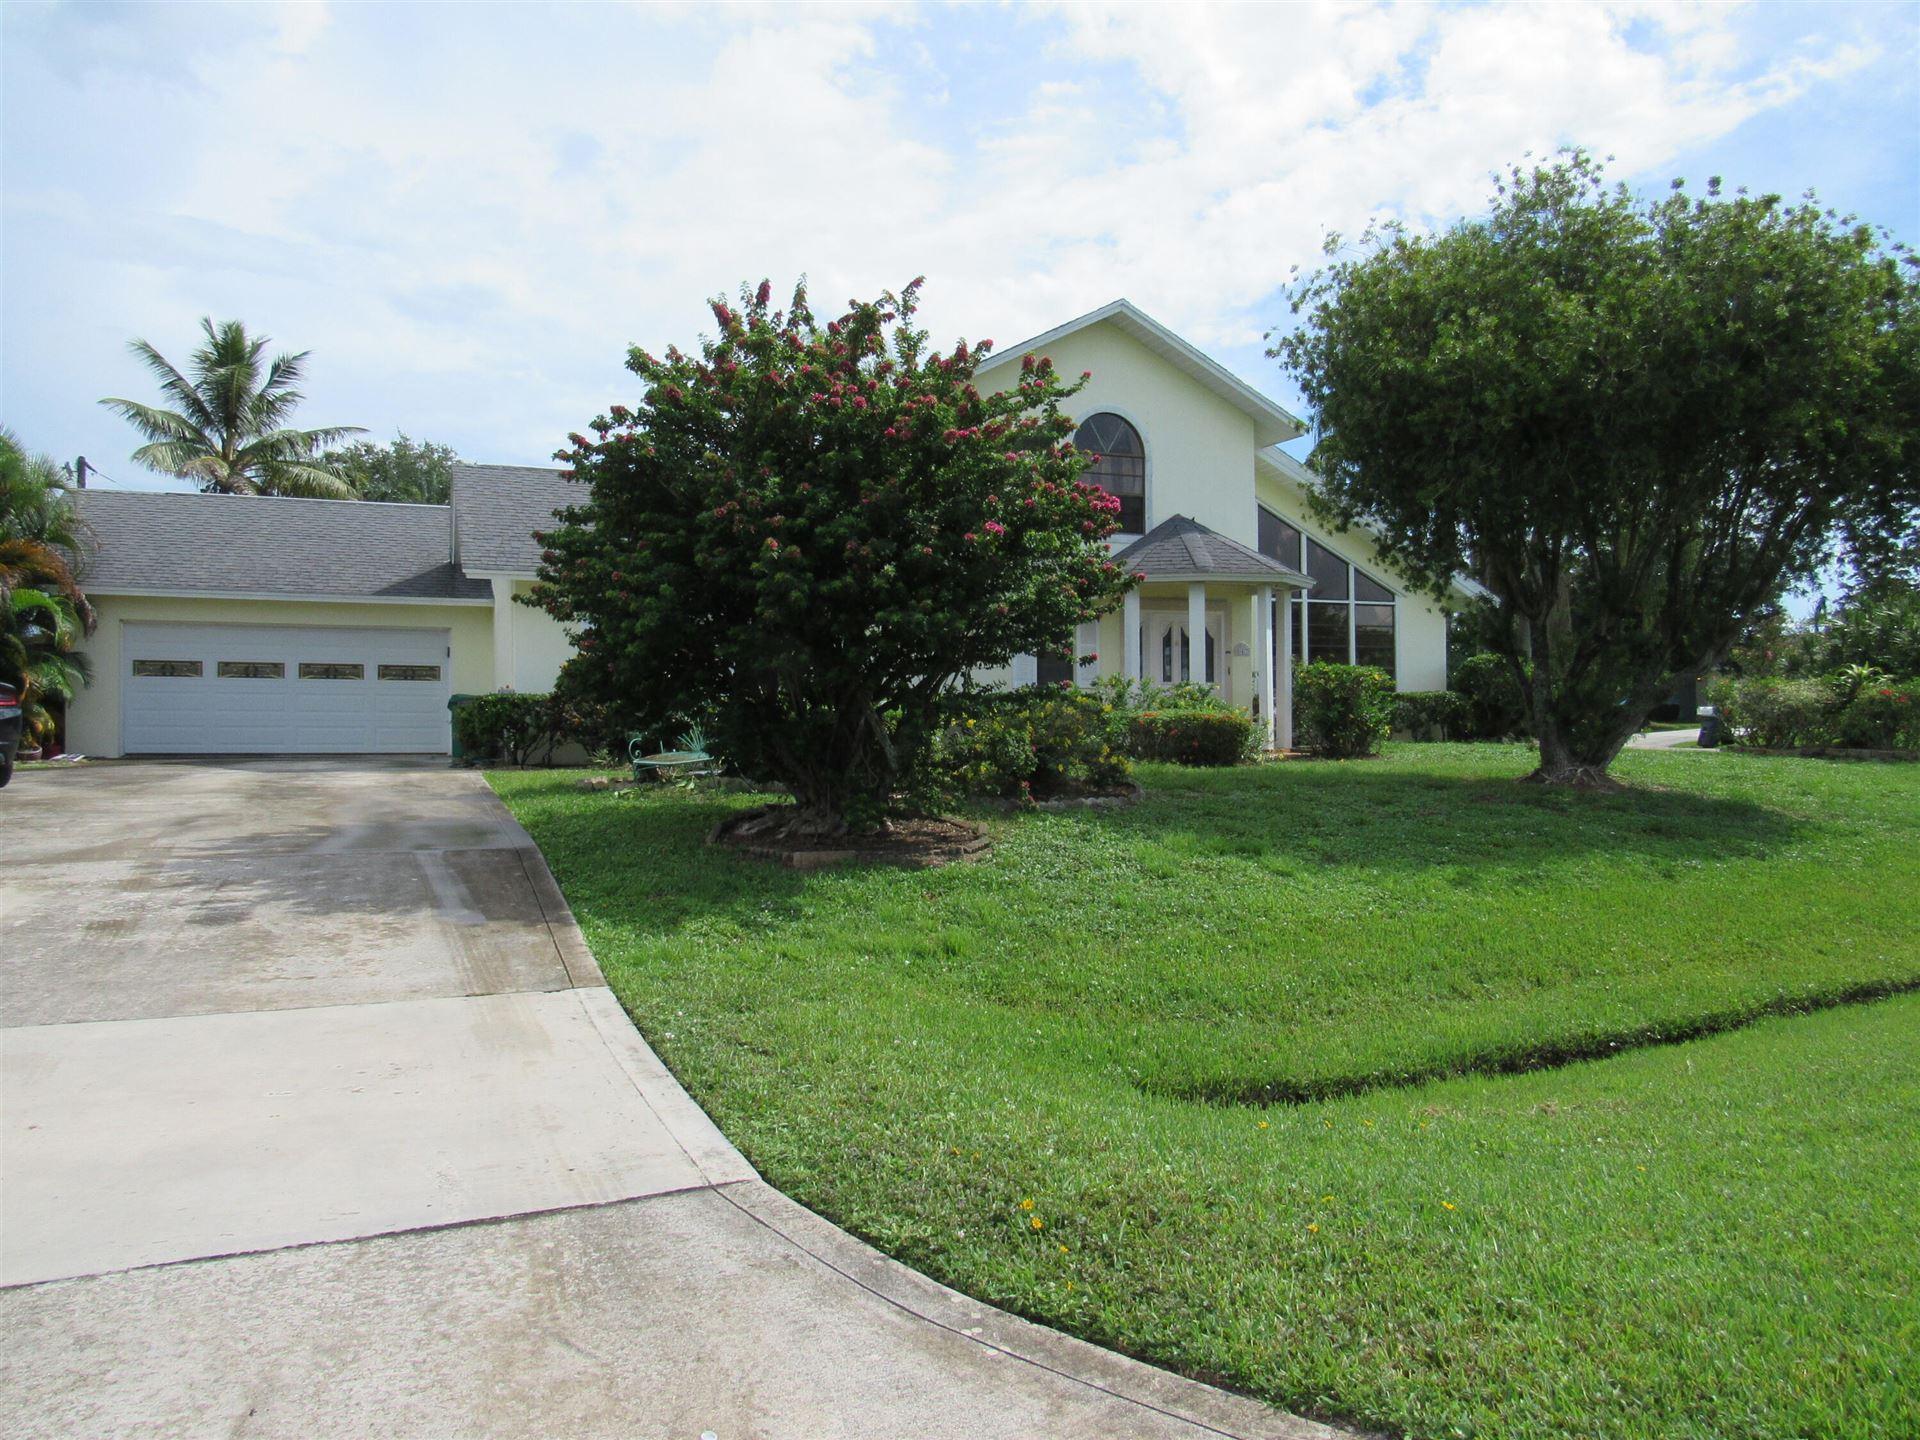 843 SE Thornhill Drive, Port Saint Lucie, FL 34983 - MLS#: RX-10730204